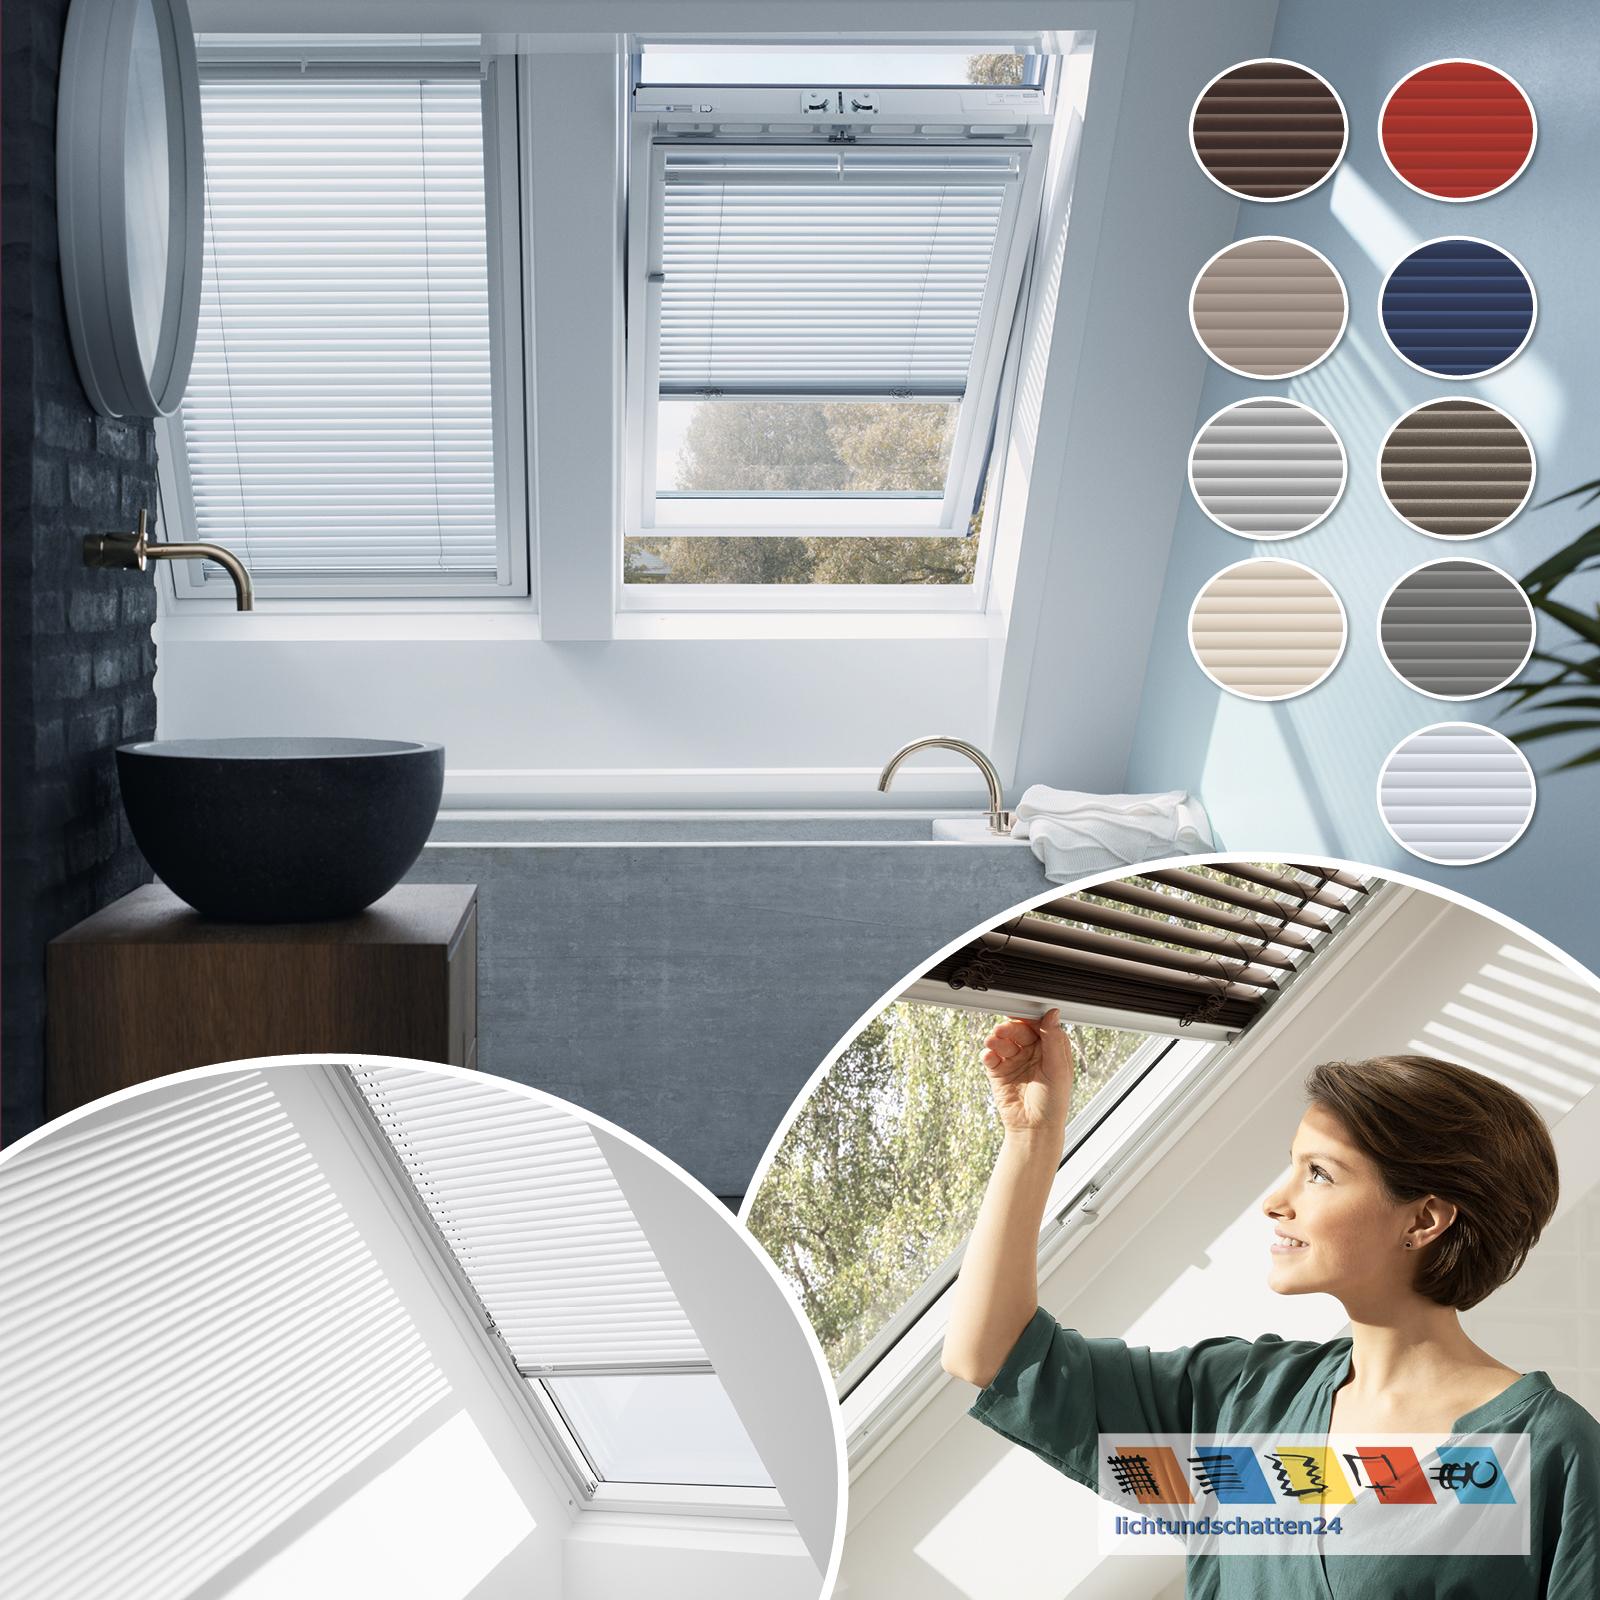 orig velux dachfenster jalousie jalousette rollo pal f r. Black Bedroom Furniture Sets. Home Design Ideas